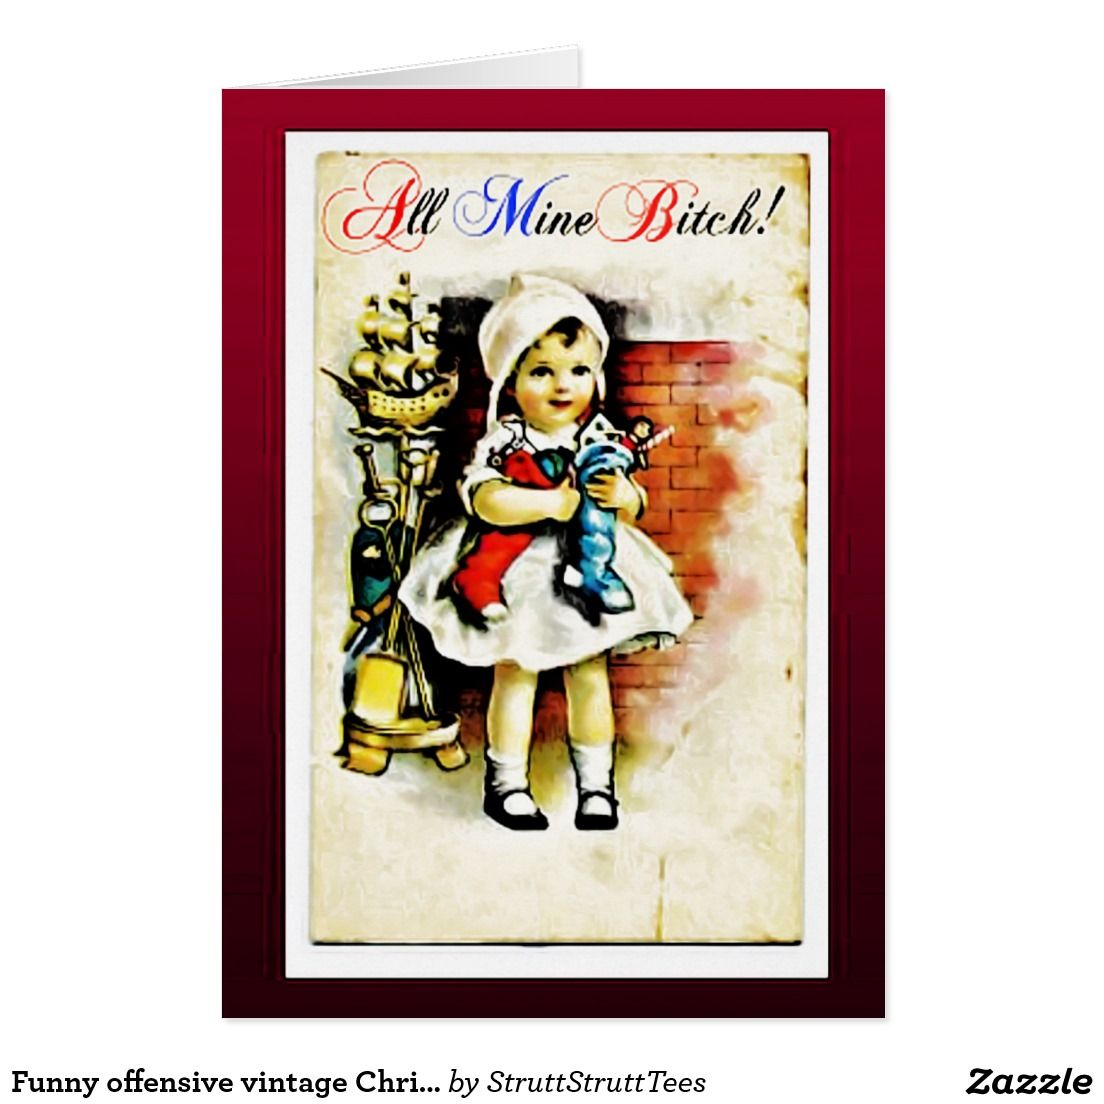 Funny offensive vintage Christmas card | Pinterest | Vintage ...